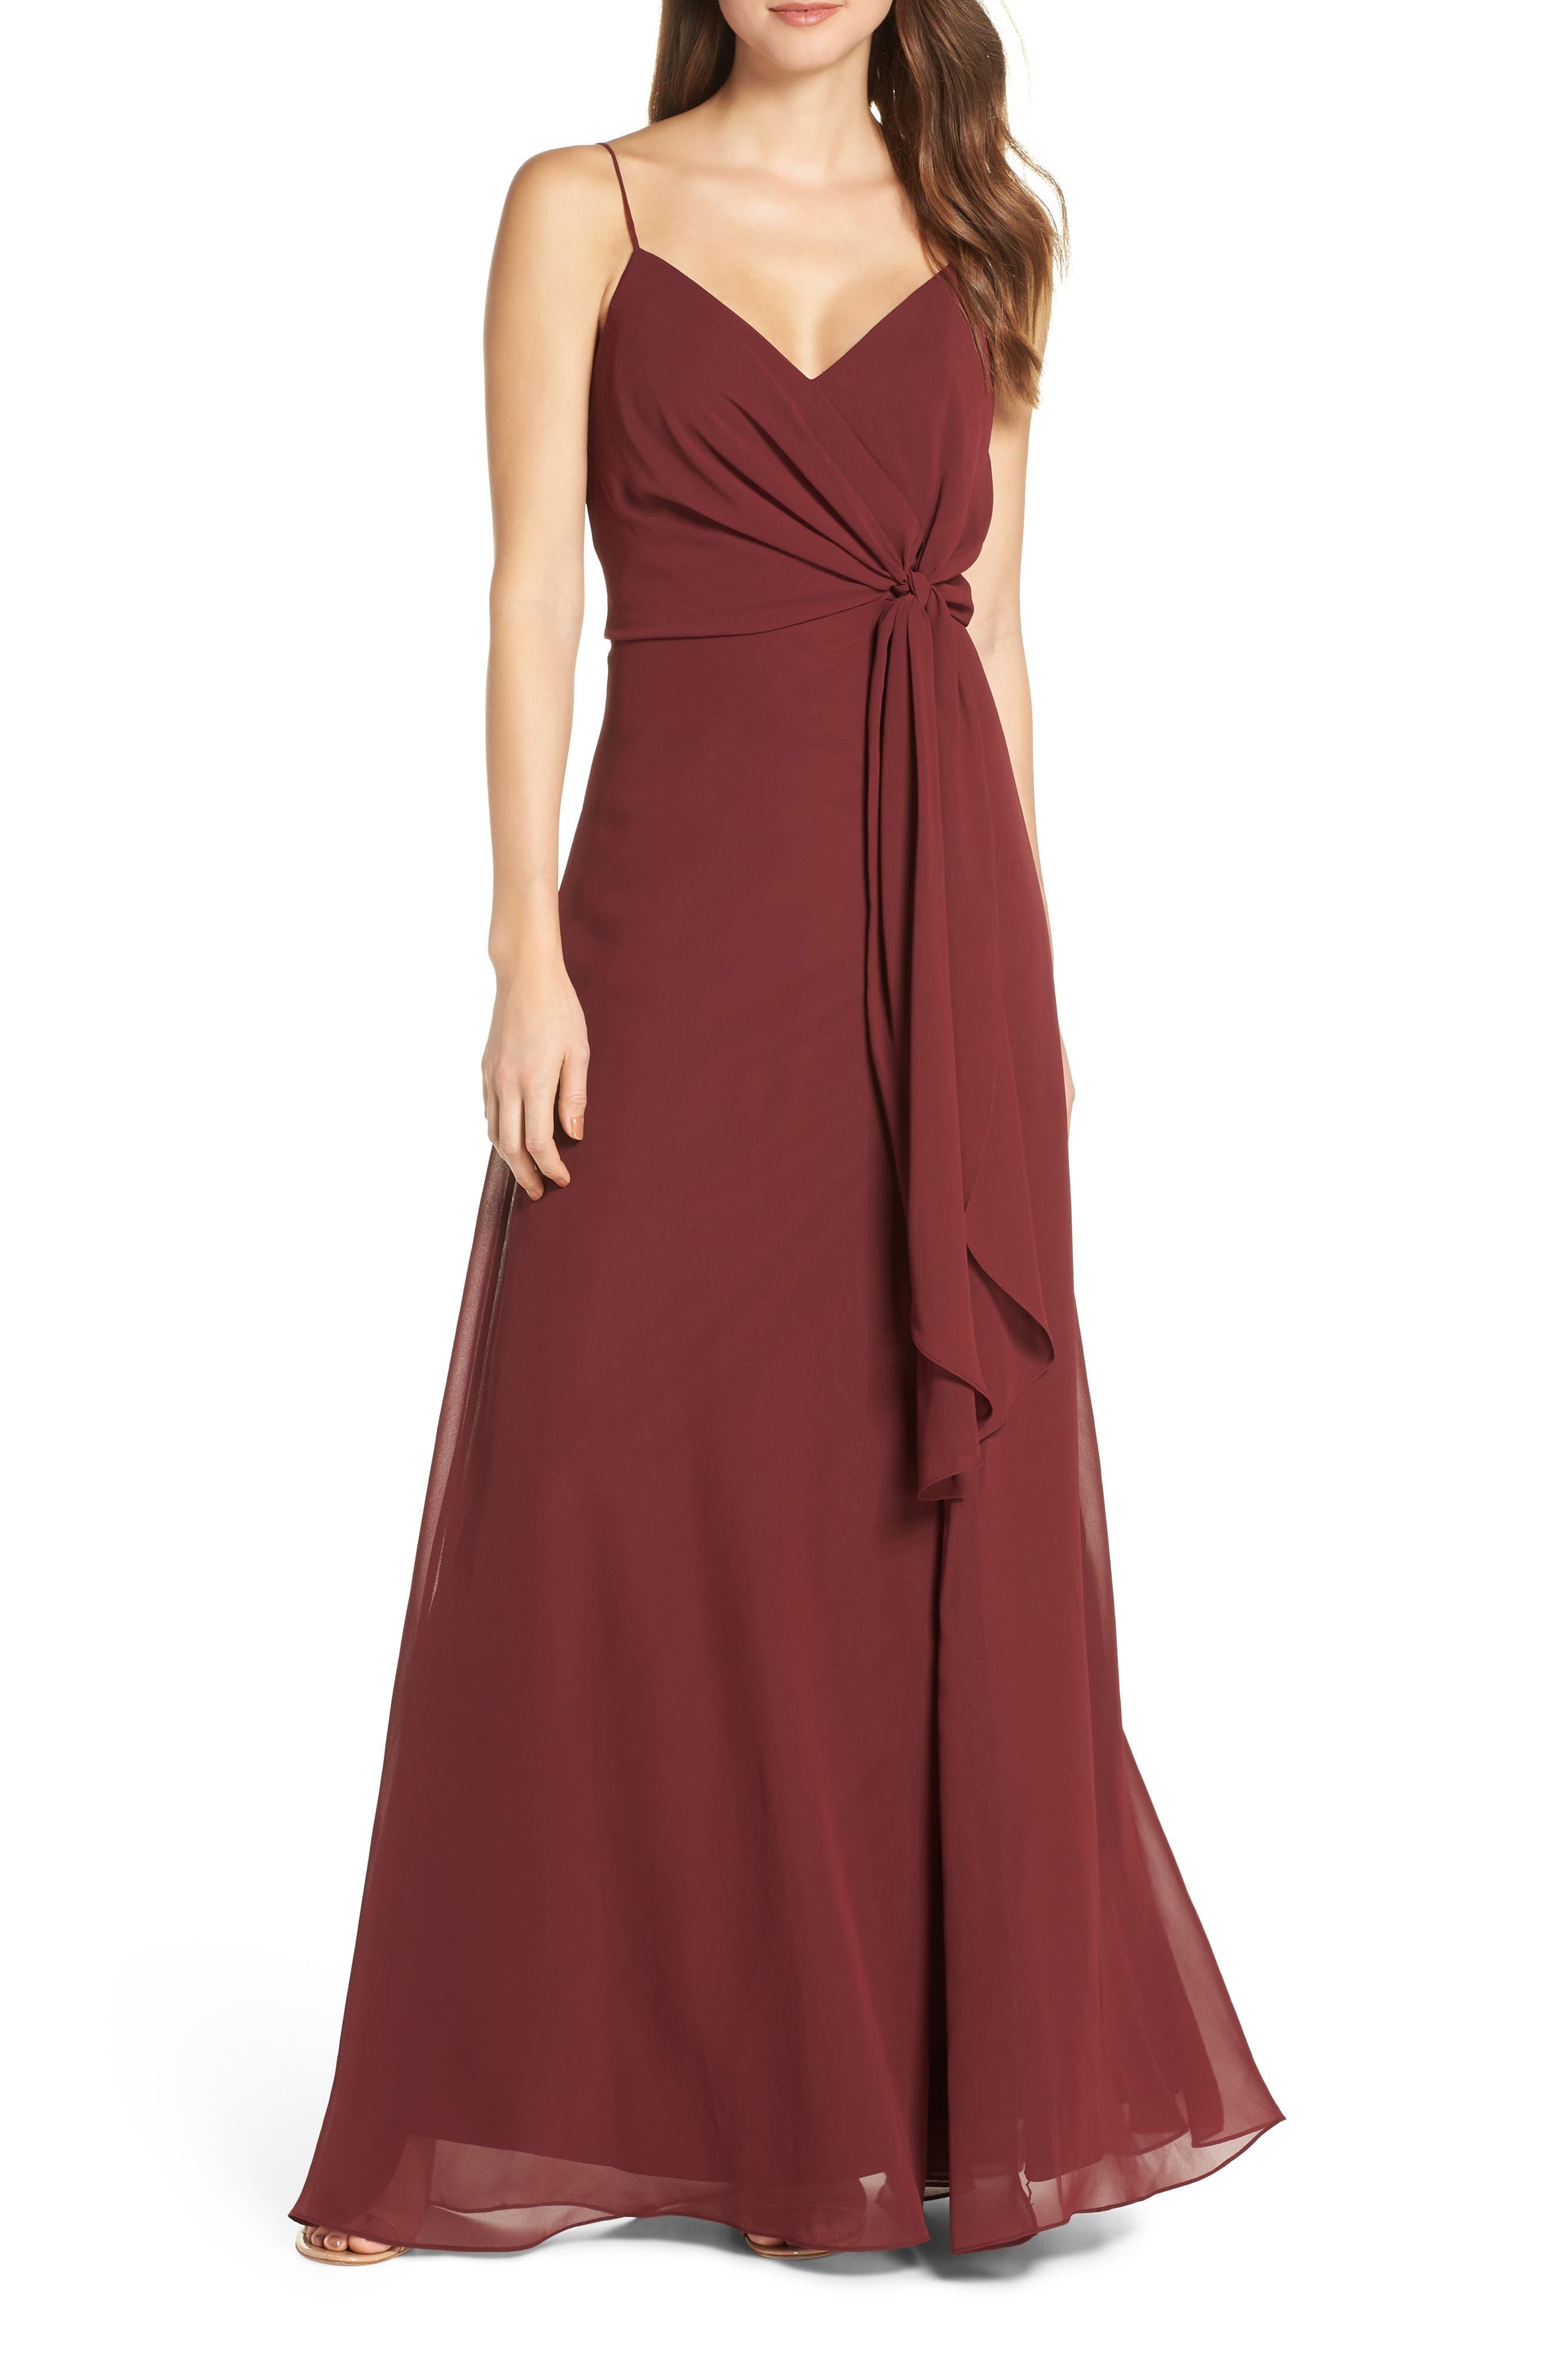 Jenny Yoo Amara Chiffon Overlay V-Neck Evening Dress